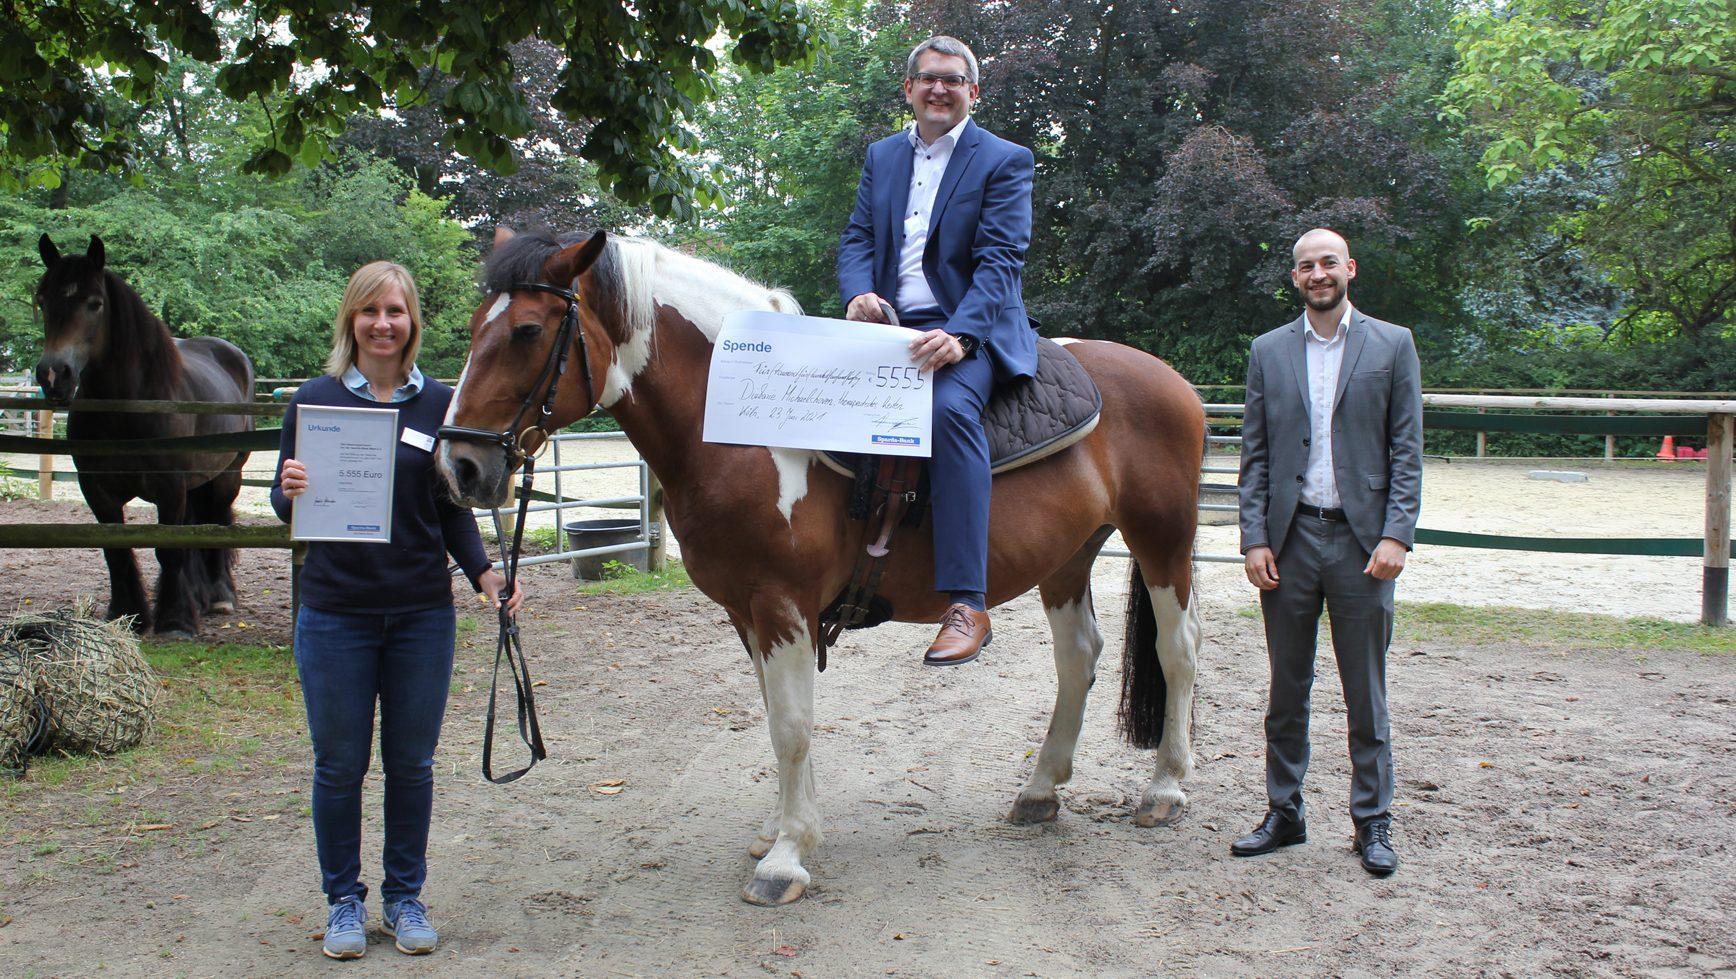 Diakonie Michaelshoven: Spardabank spendet 5.555 Euro an Reitbereich